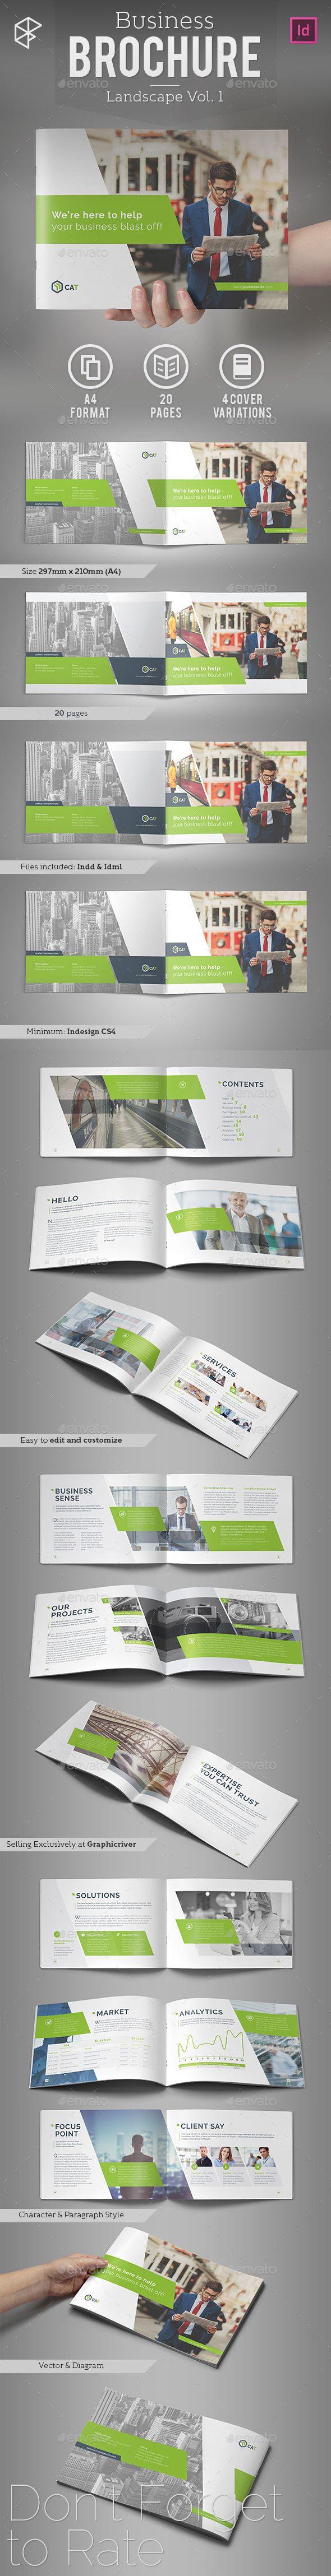 Business Brochure  Landscape Vol. 1 — InDesign INDD #financial #minimal • Available here → https://graphicriver.net/item/business-brochure-landscape-vol-1/14376917?ref=pxcr